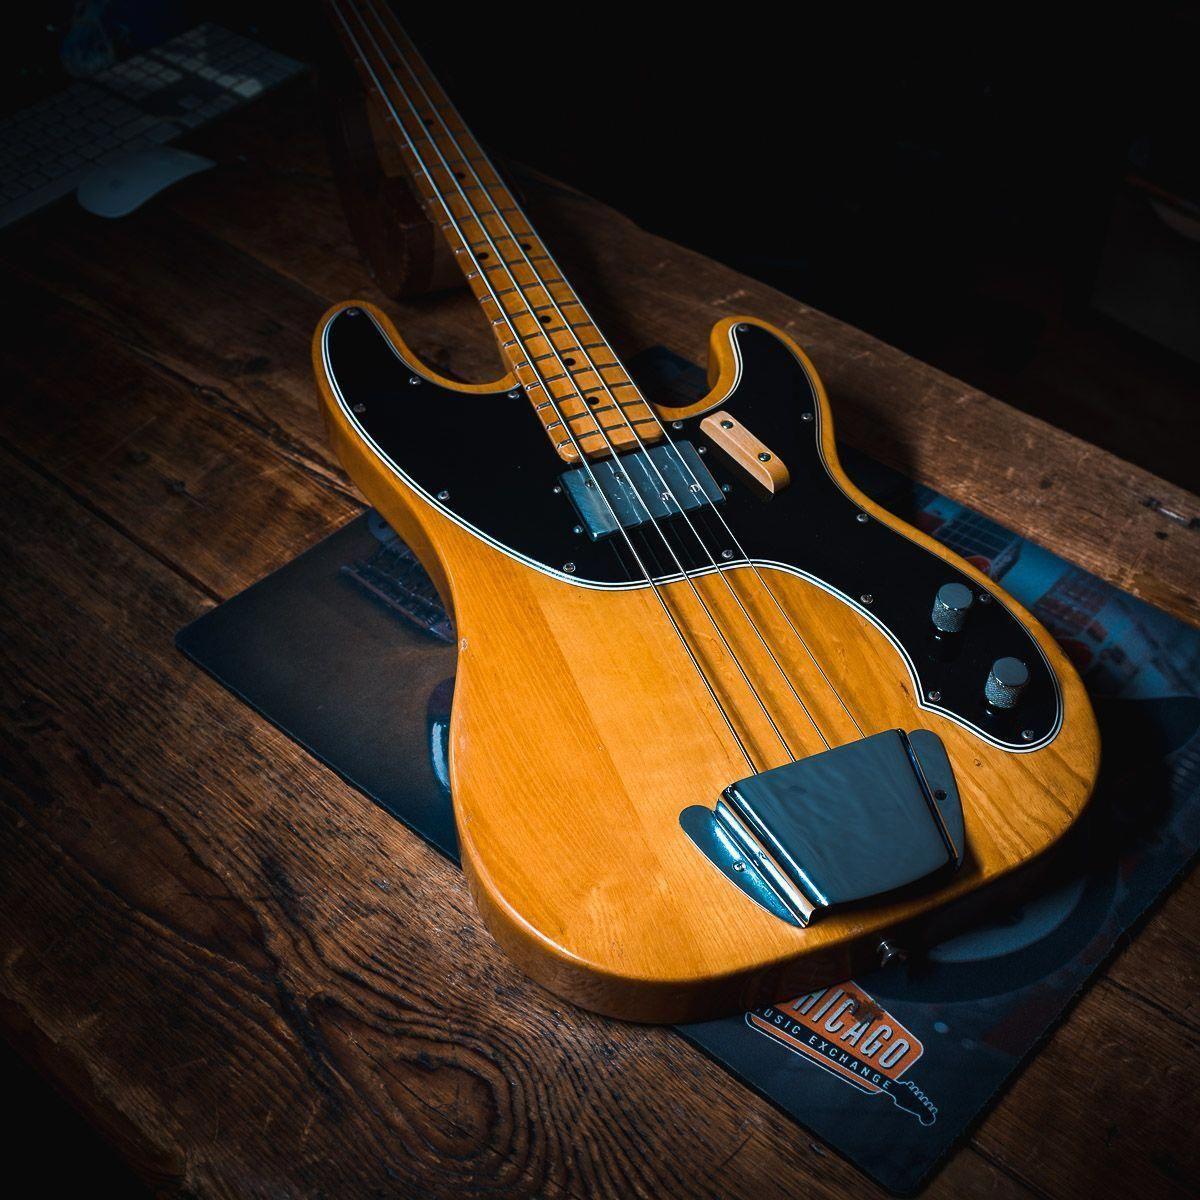 Gitara Guitar Hero Matallica 2 Gry Ps3 Unikat 7088509758 Oficjalne Archiwum Allegro